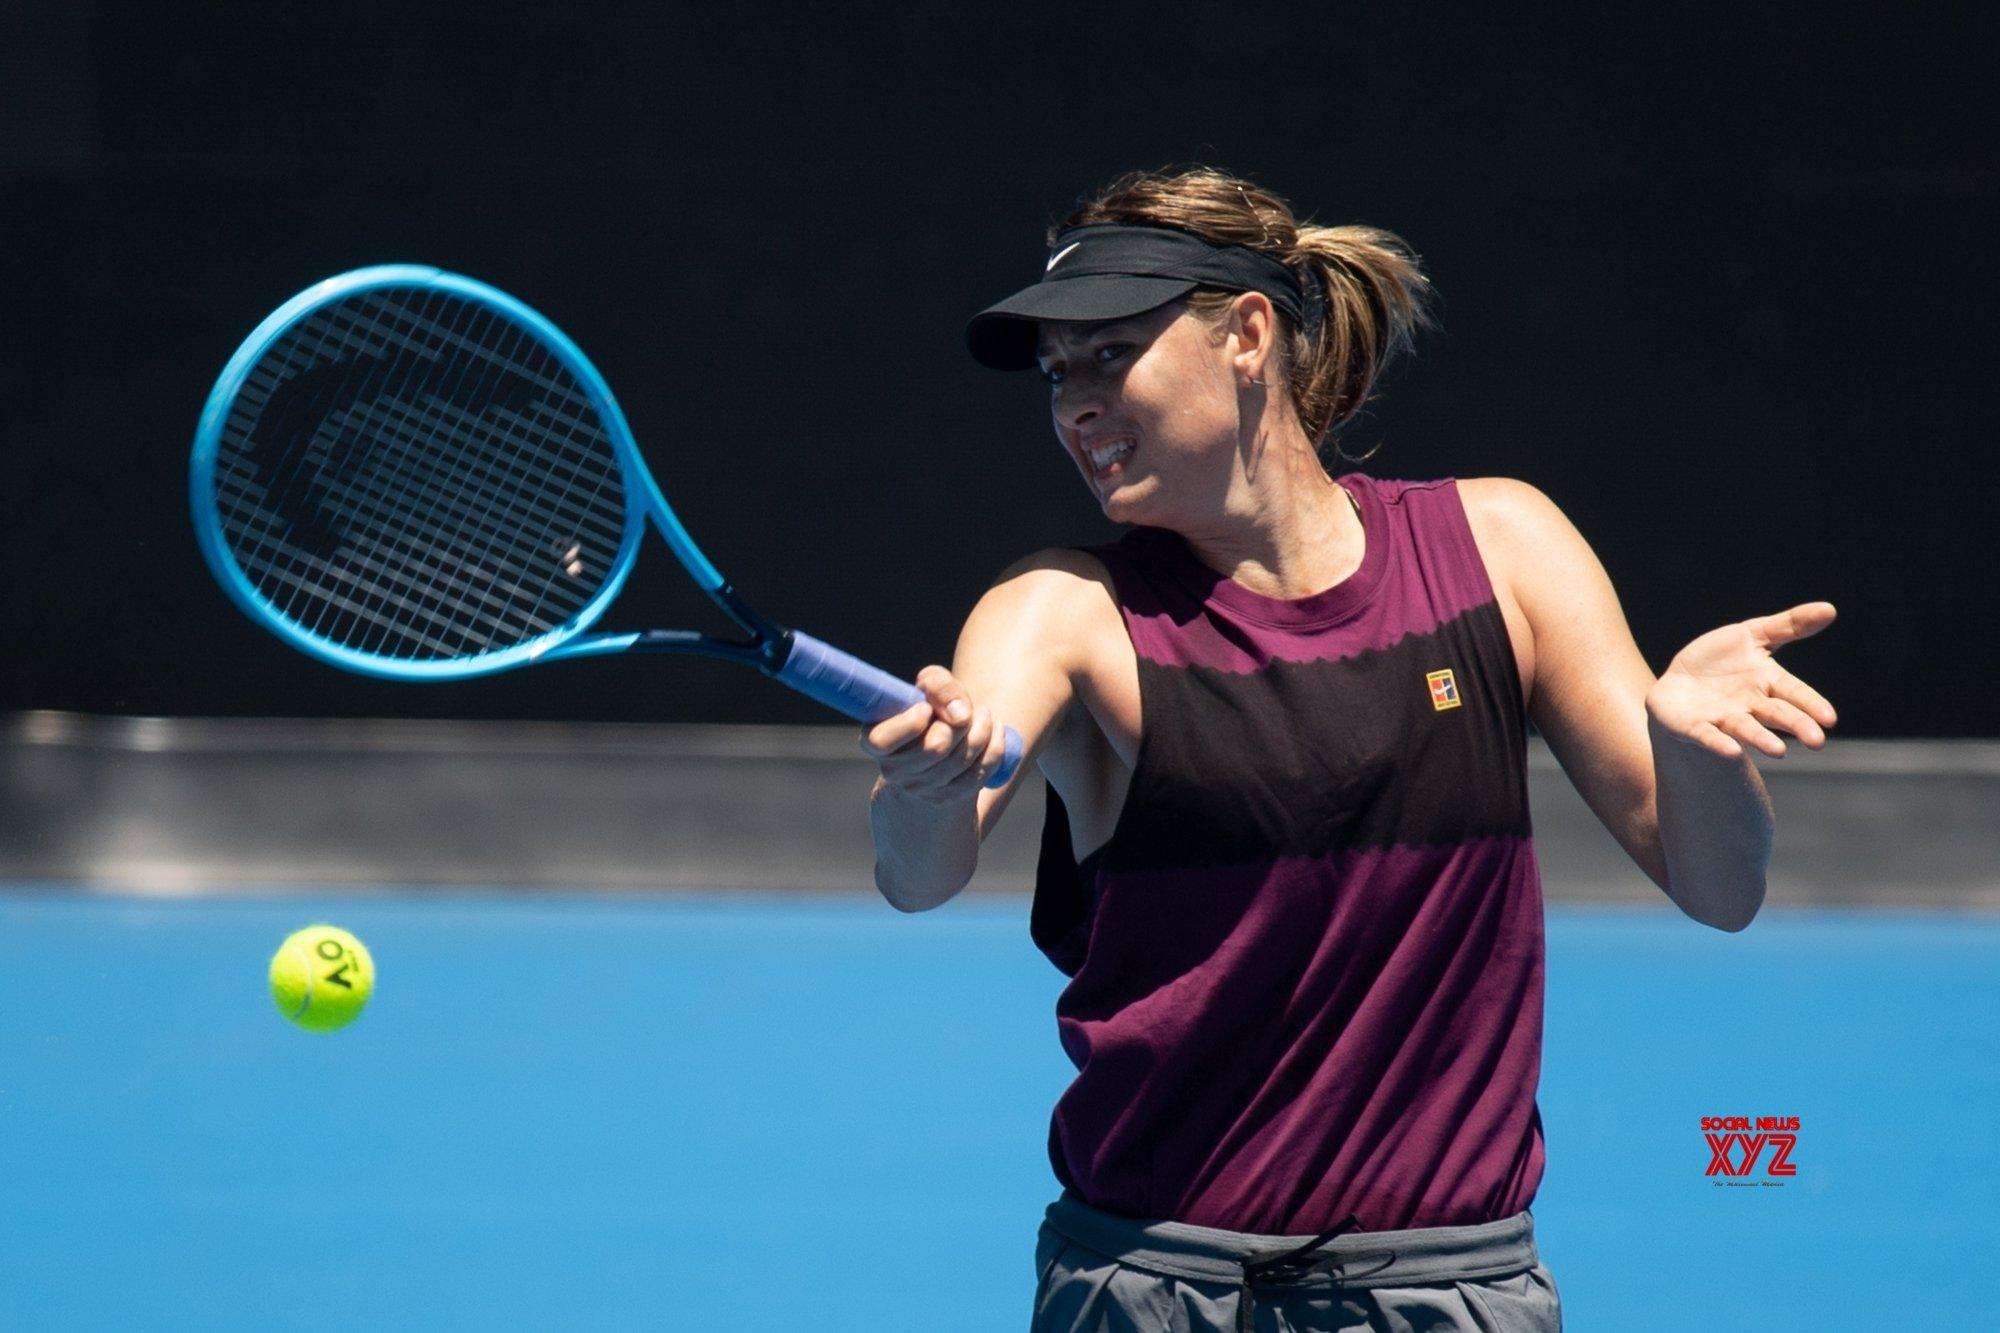 Sharapova routs Dart in straight sets at Australian Open